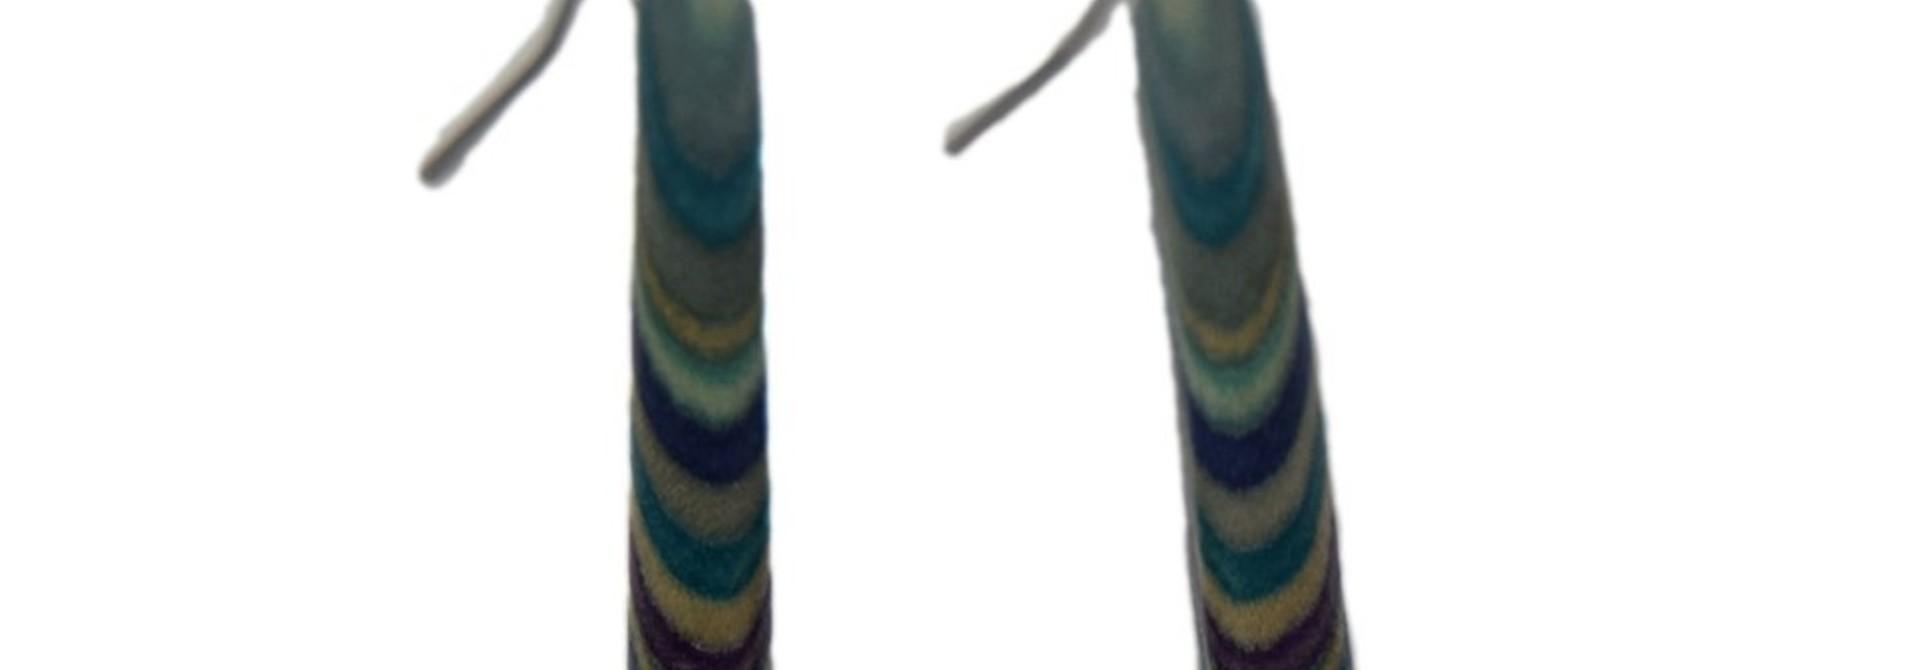 Skinny Mini Earrings